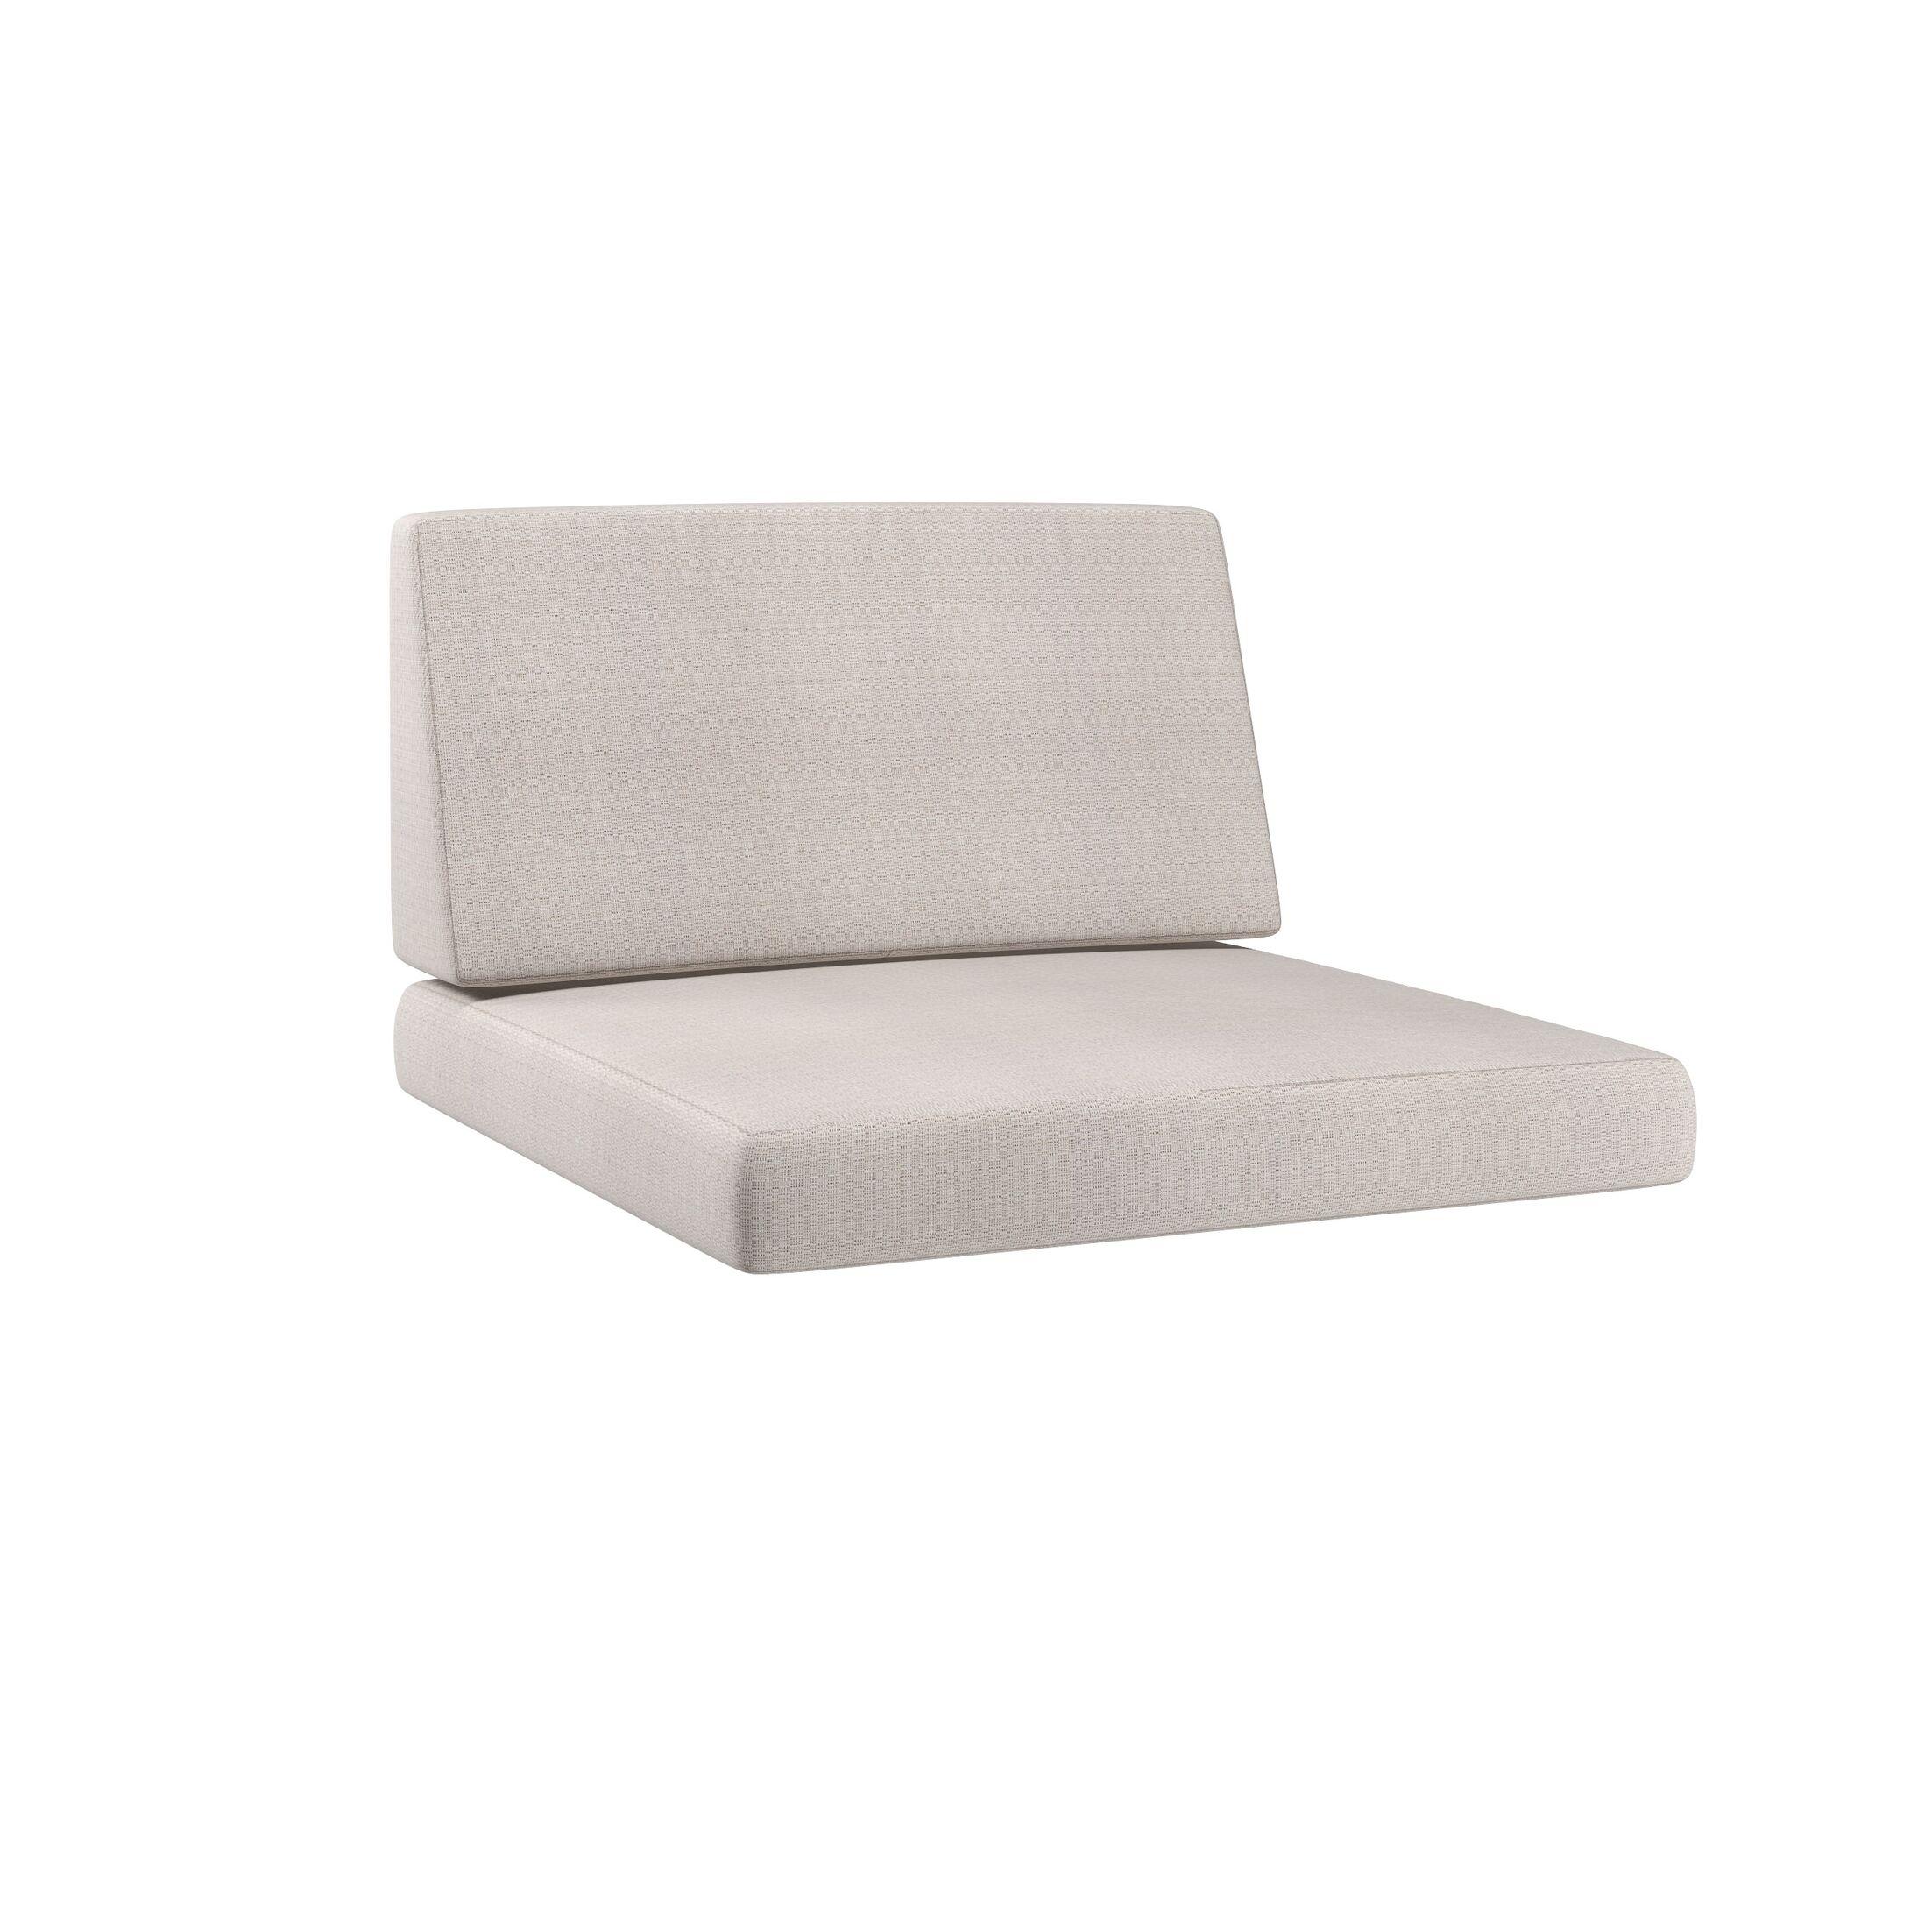 Chretien 2 Piece Indoor/Outdoor Middle Chair Cushion Set Fabric: Salt/Pepper